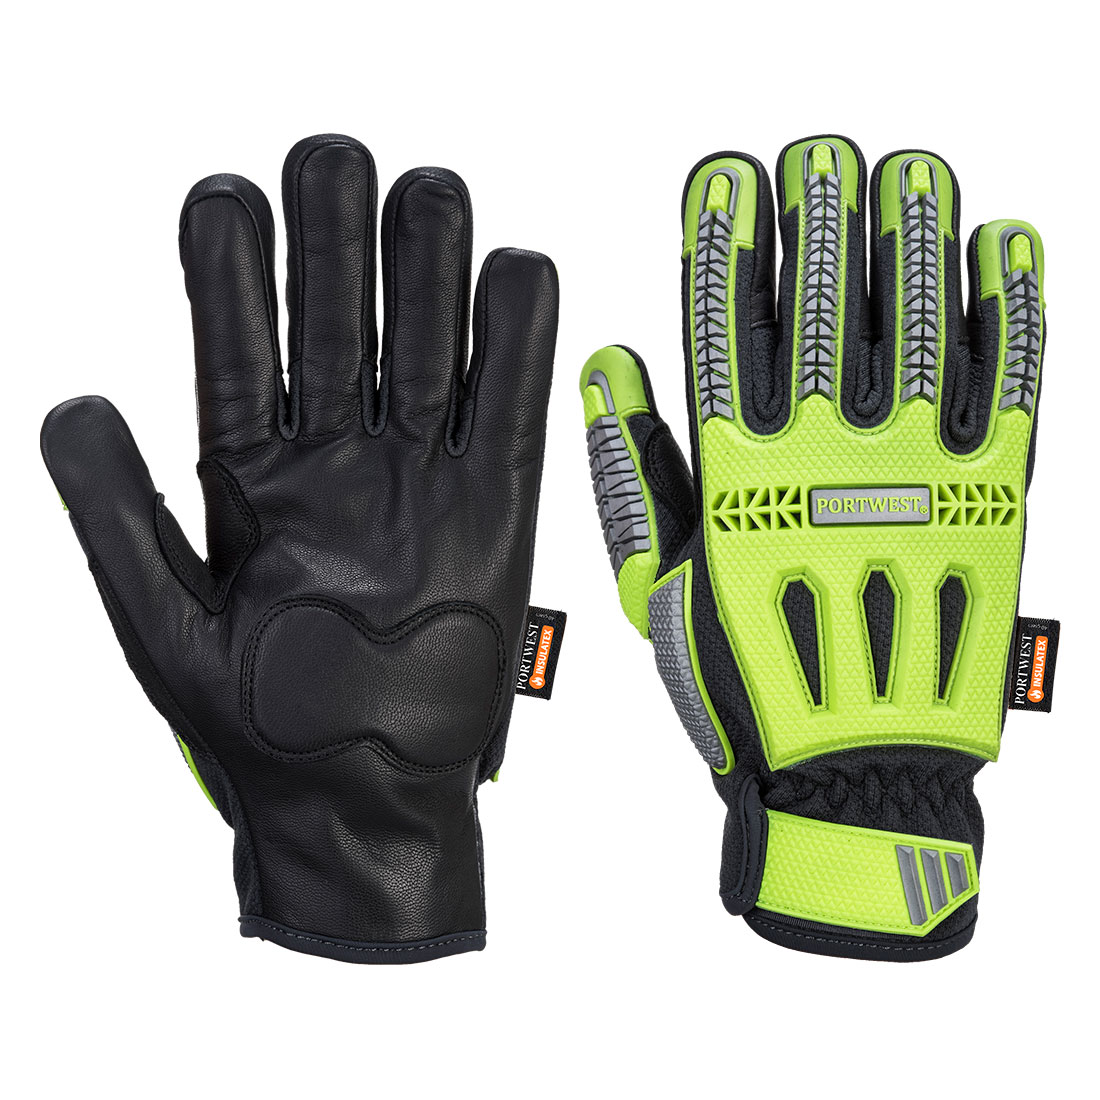 R3 Impact Winter Glove Yellow/Black XLR